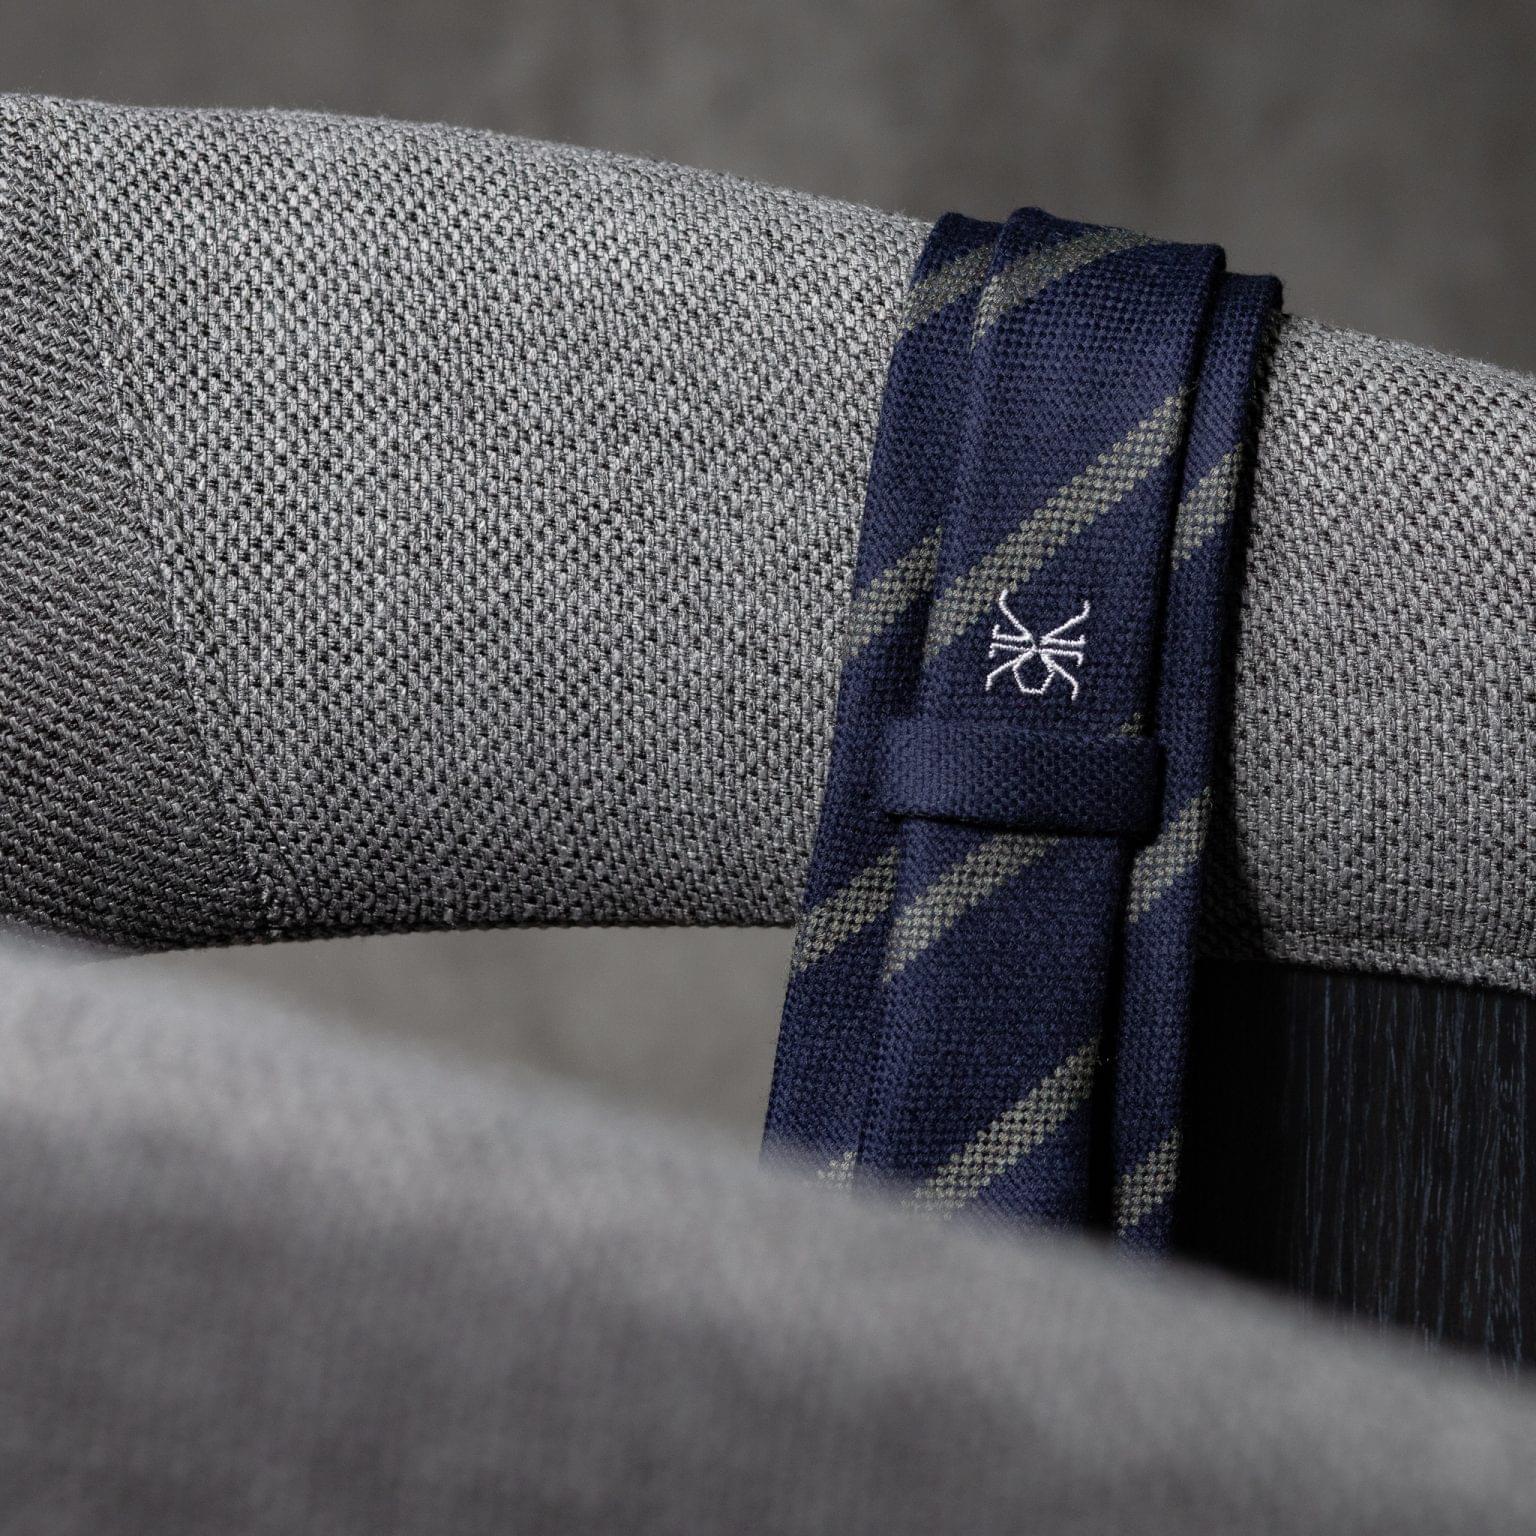 WOOL-LANA-0518-Tie-Initials-Corbata-Iniciales-The-Seelk-4